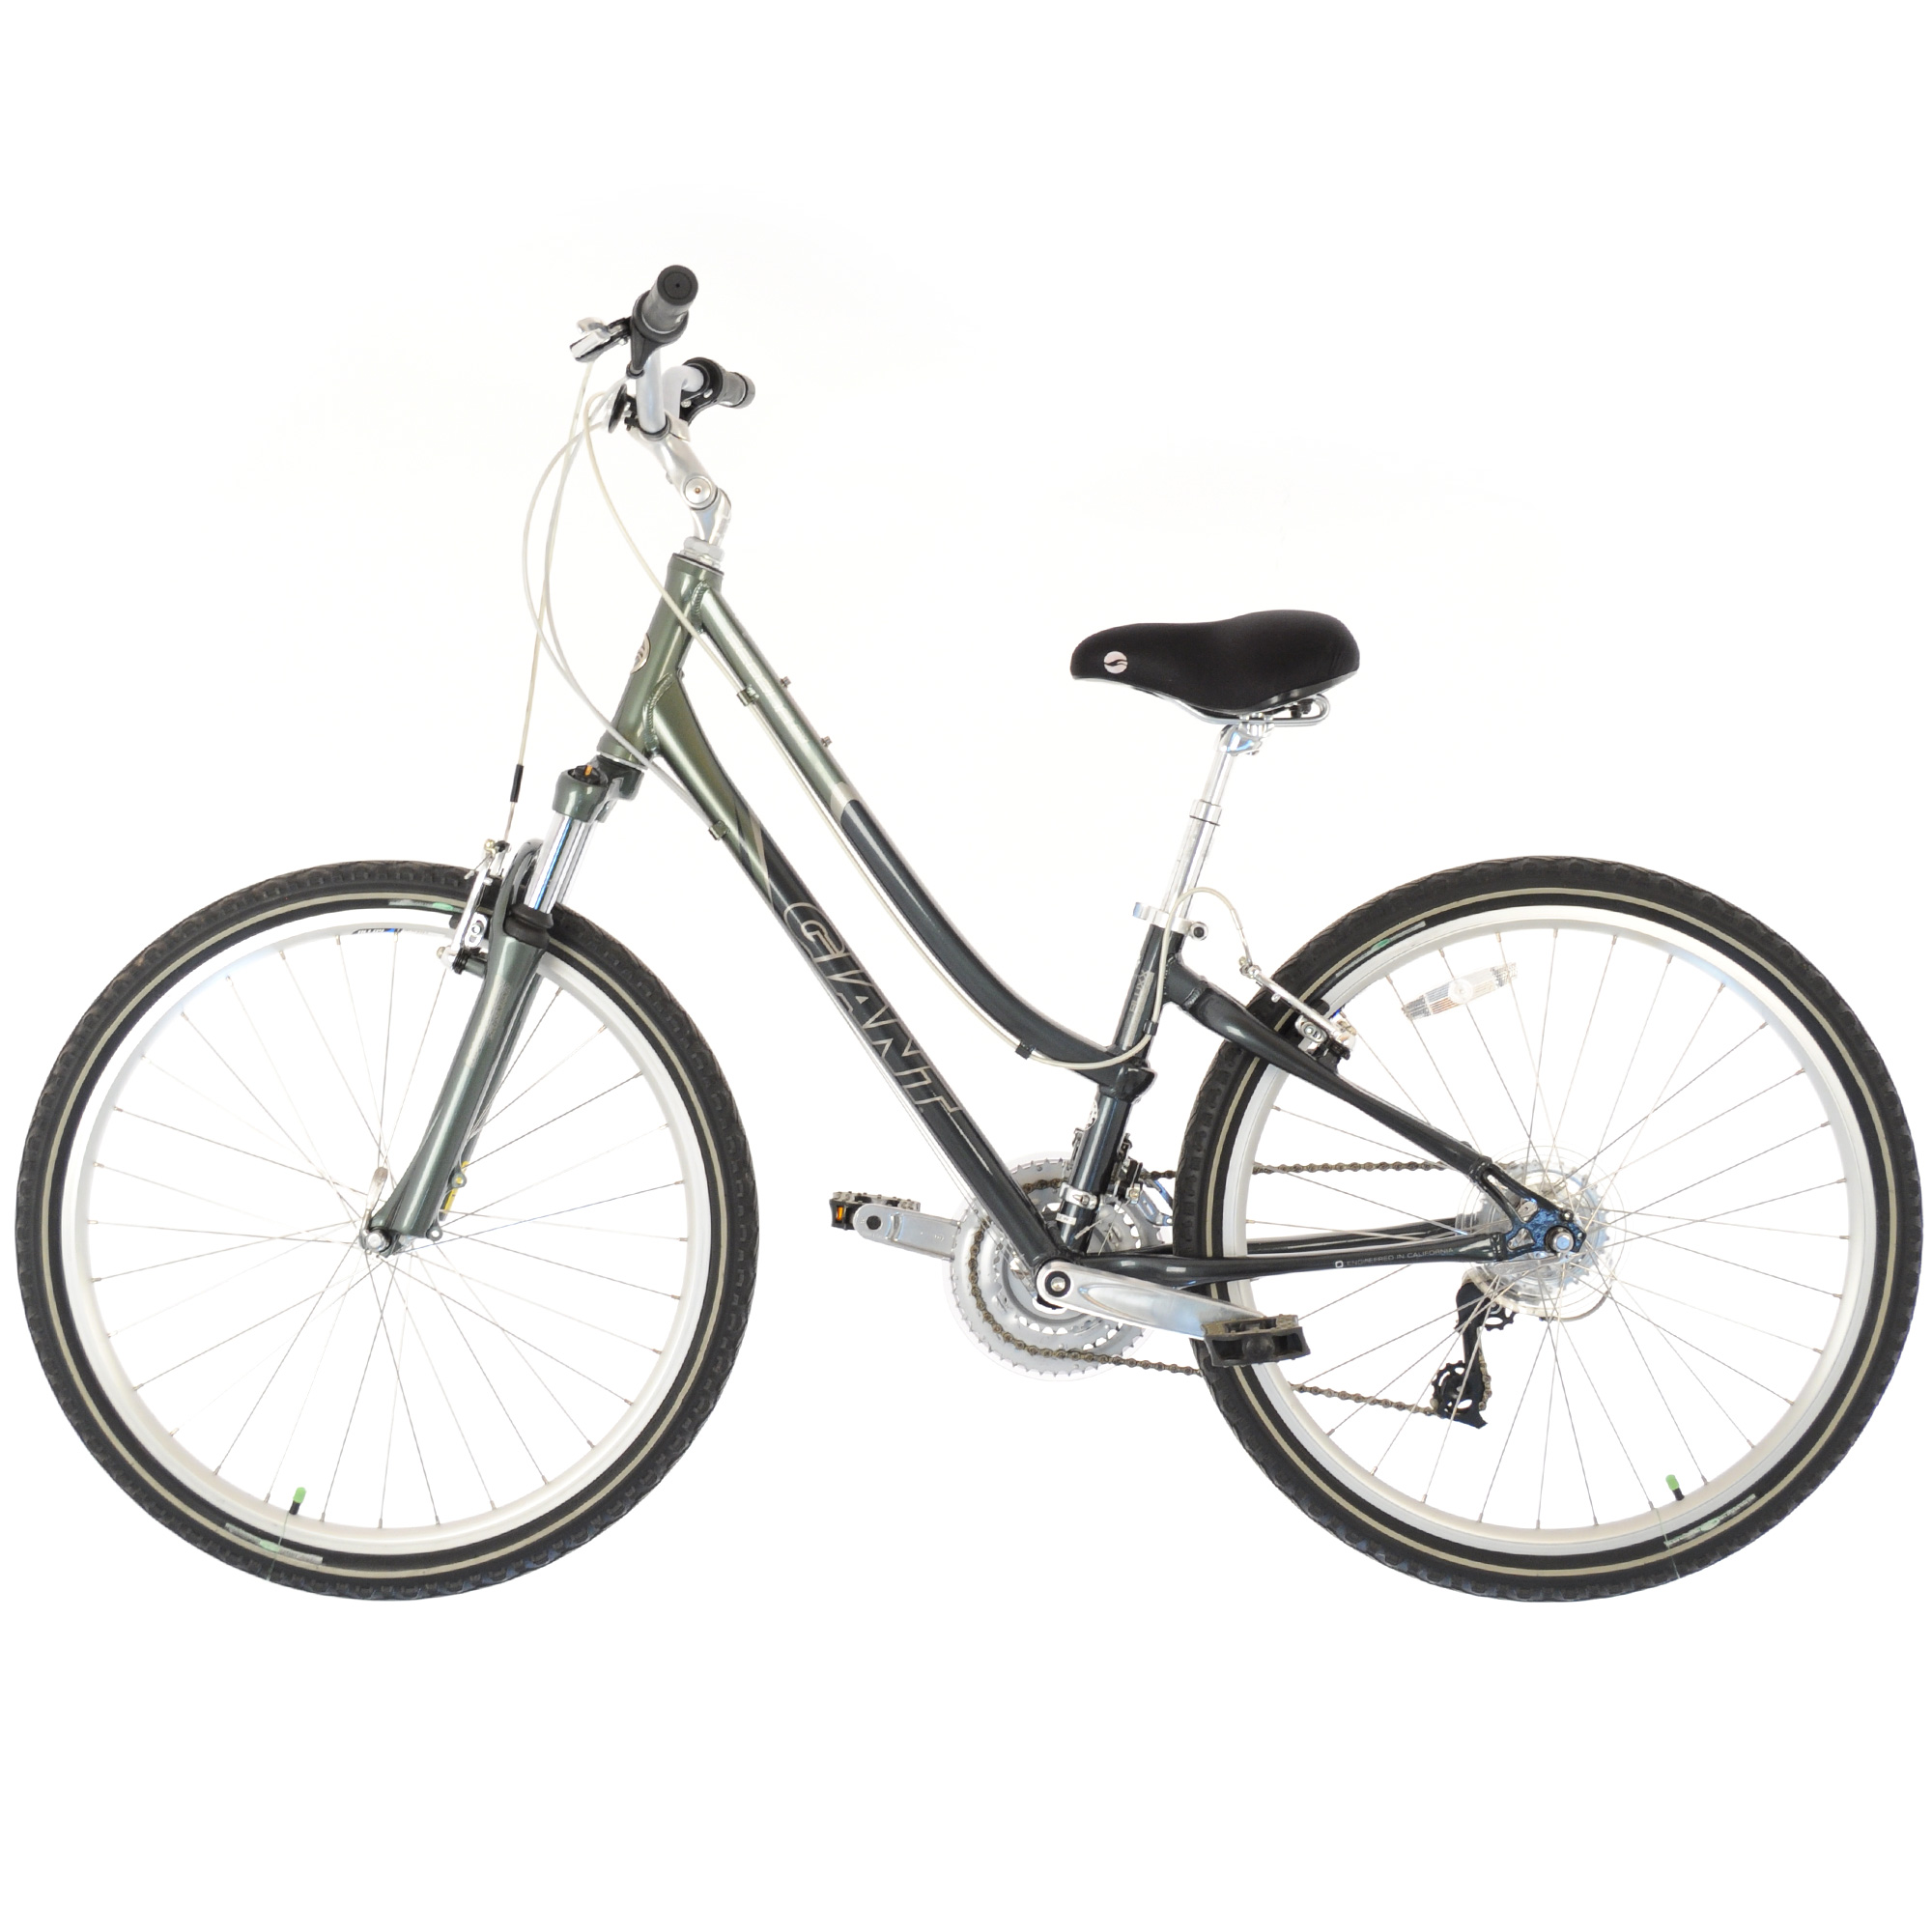 Giant Sedona Dx Womens Hybrid Bike